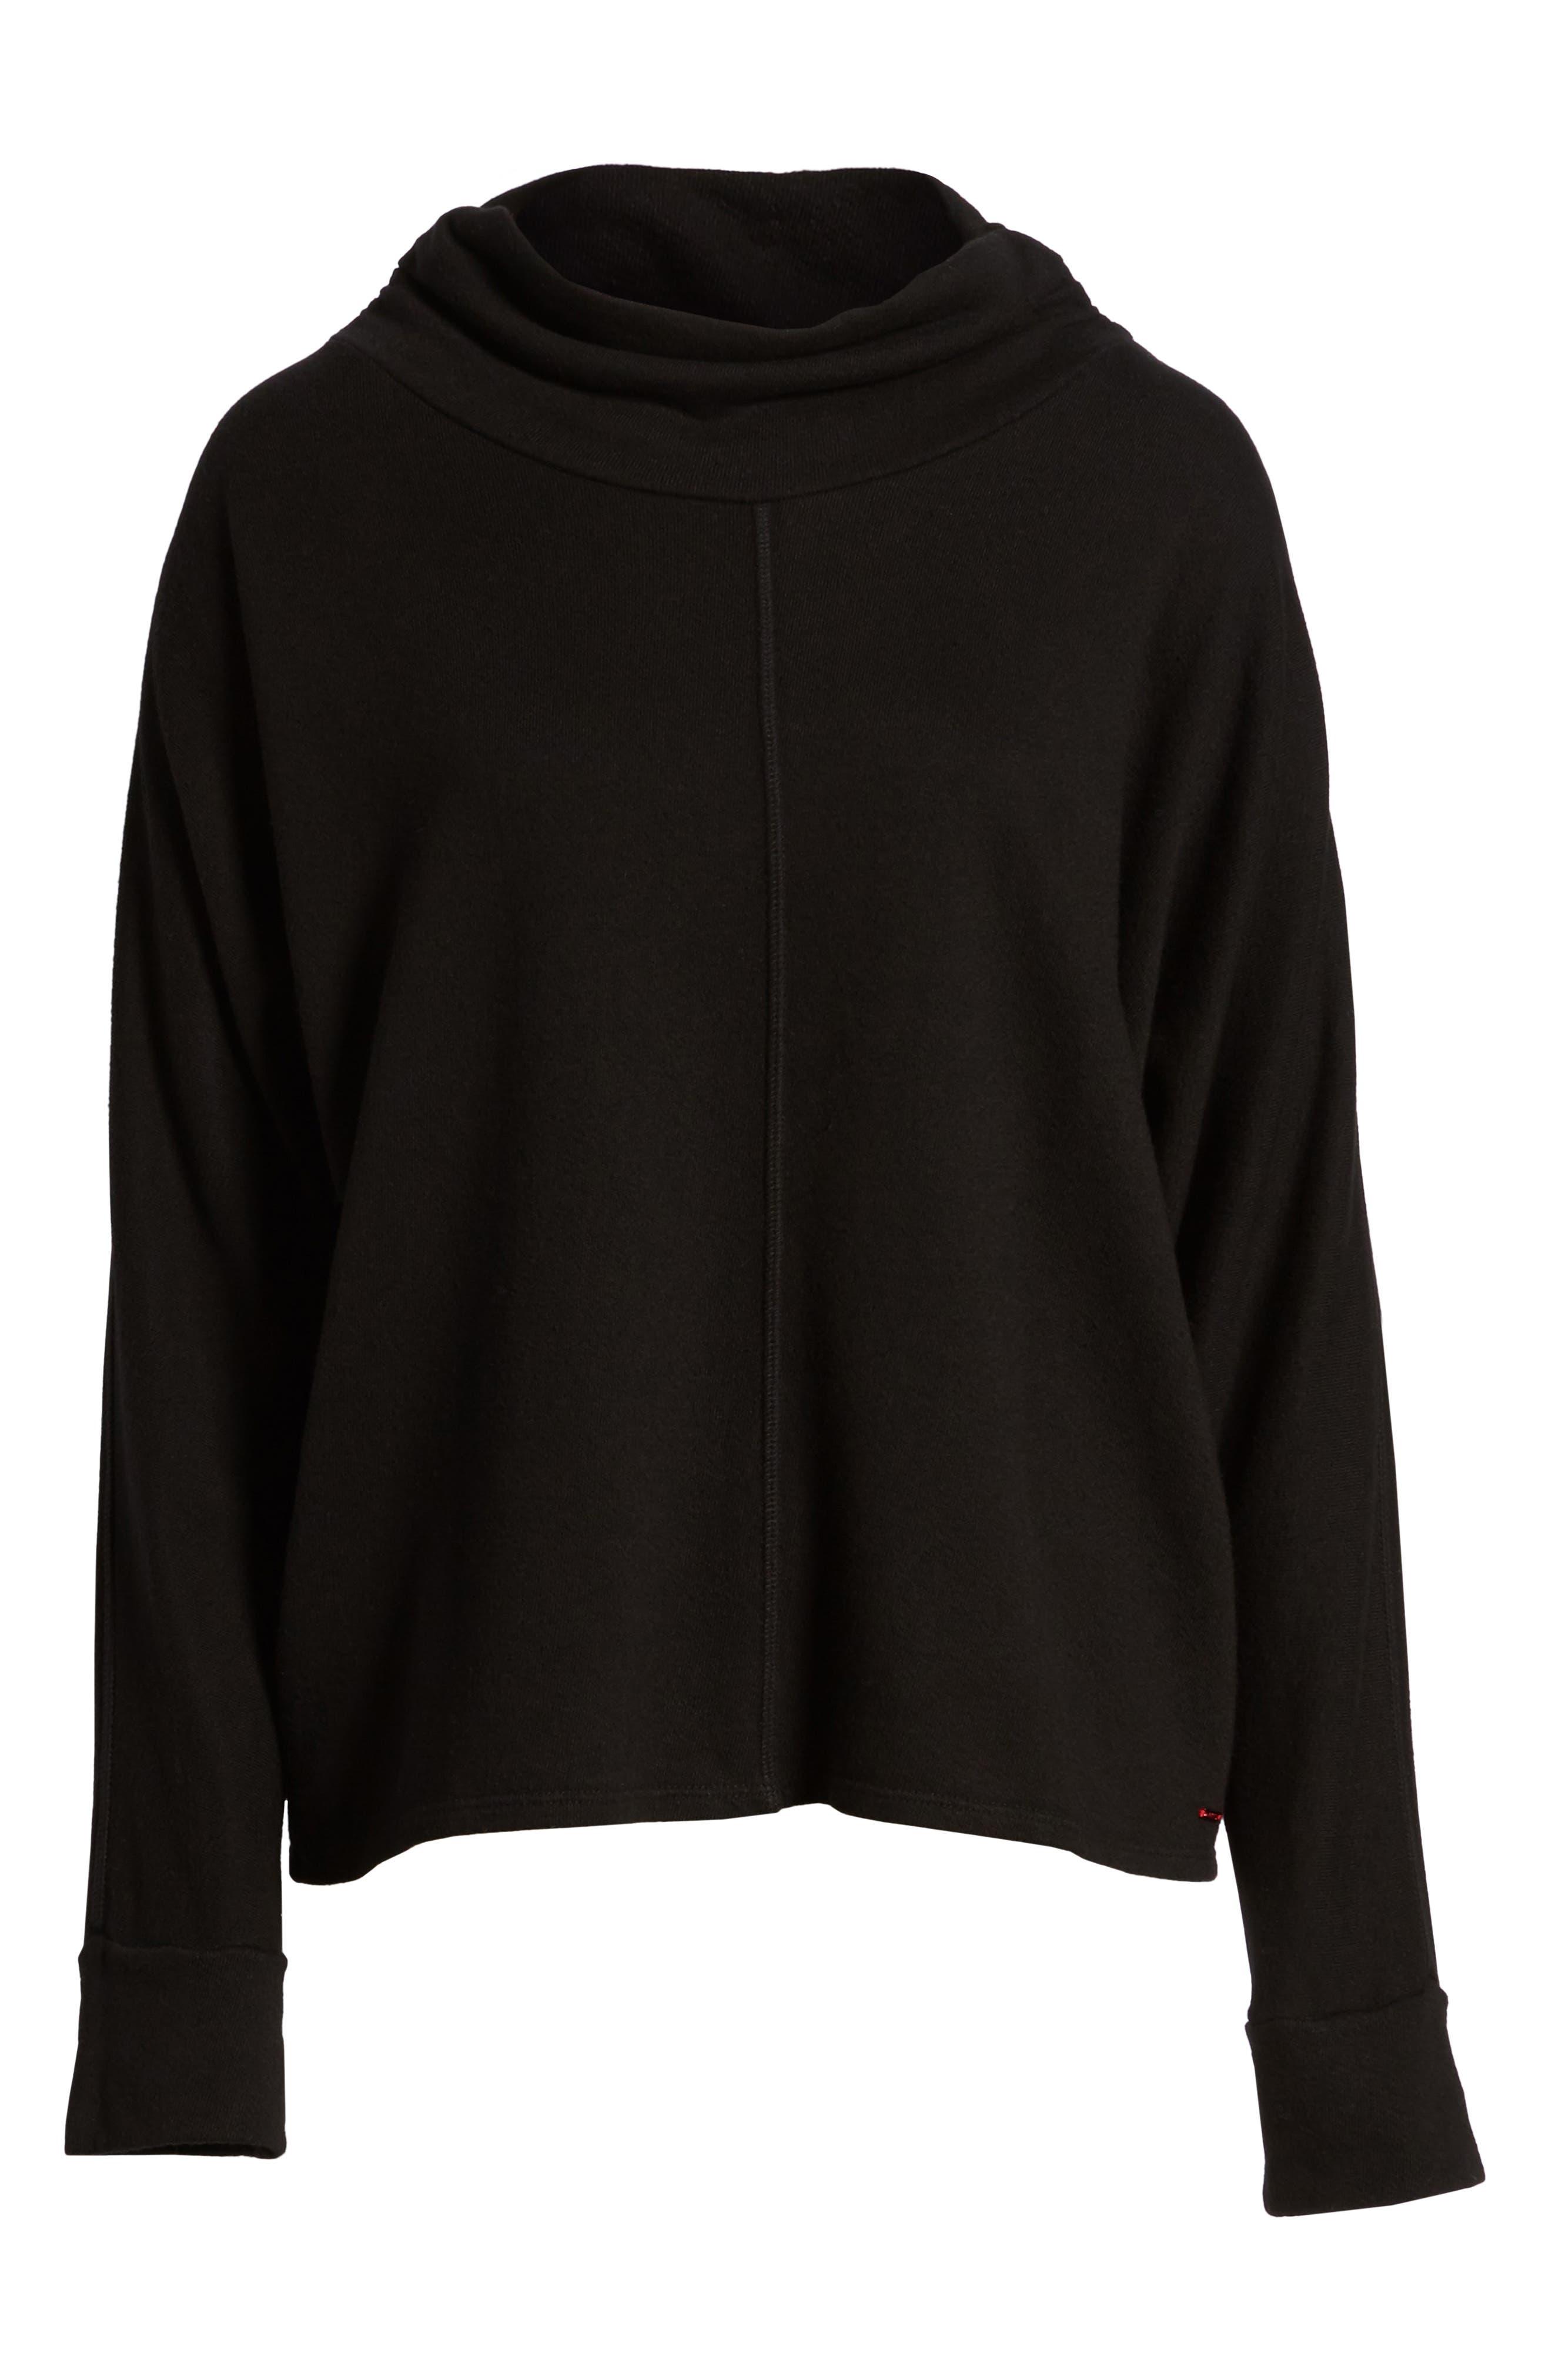 Helix Turtleneck Sweatshirt,                             Alternate thumbnail 6, color,                             001